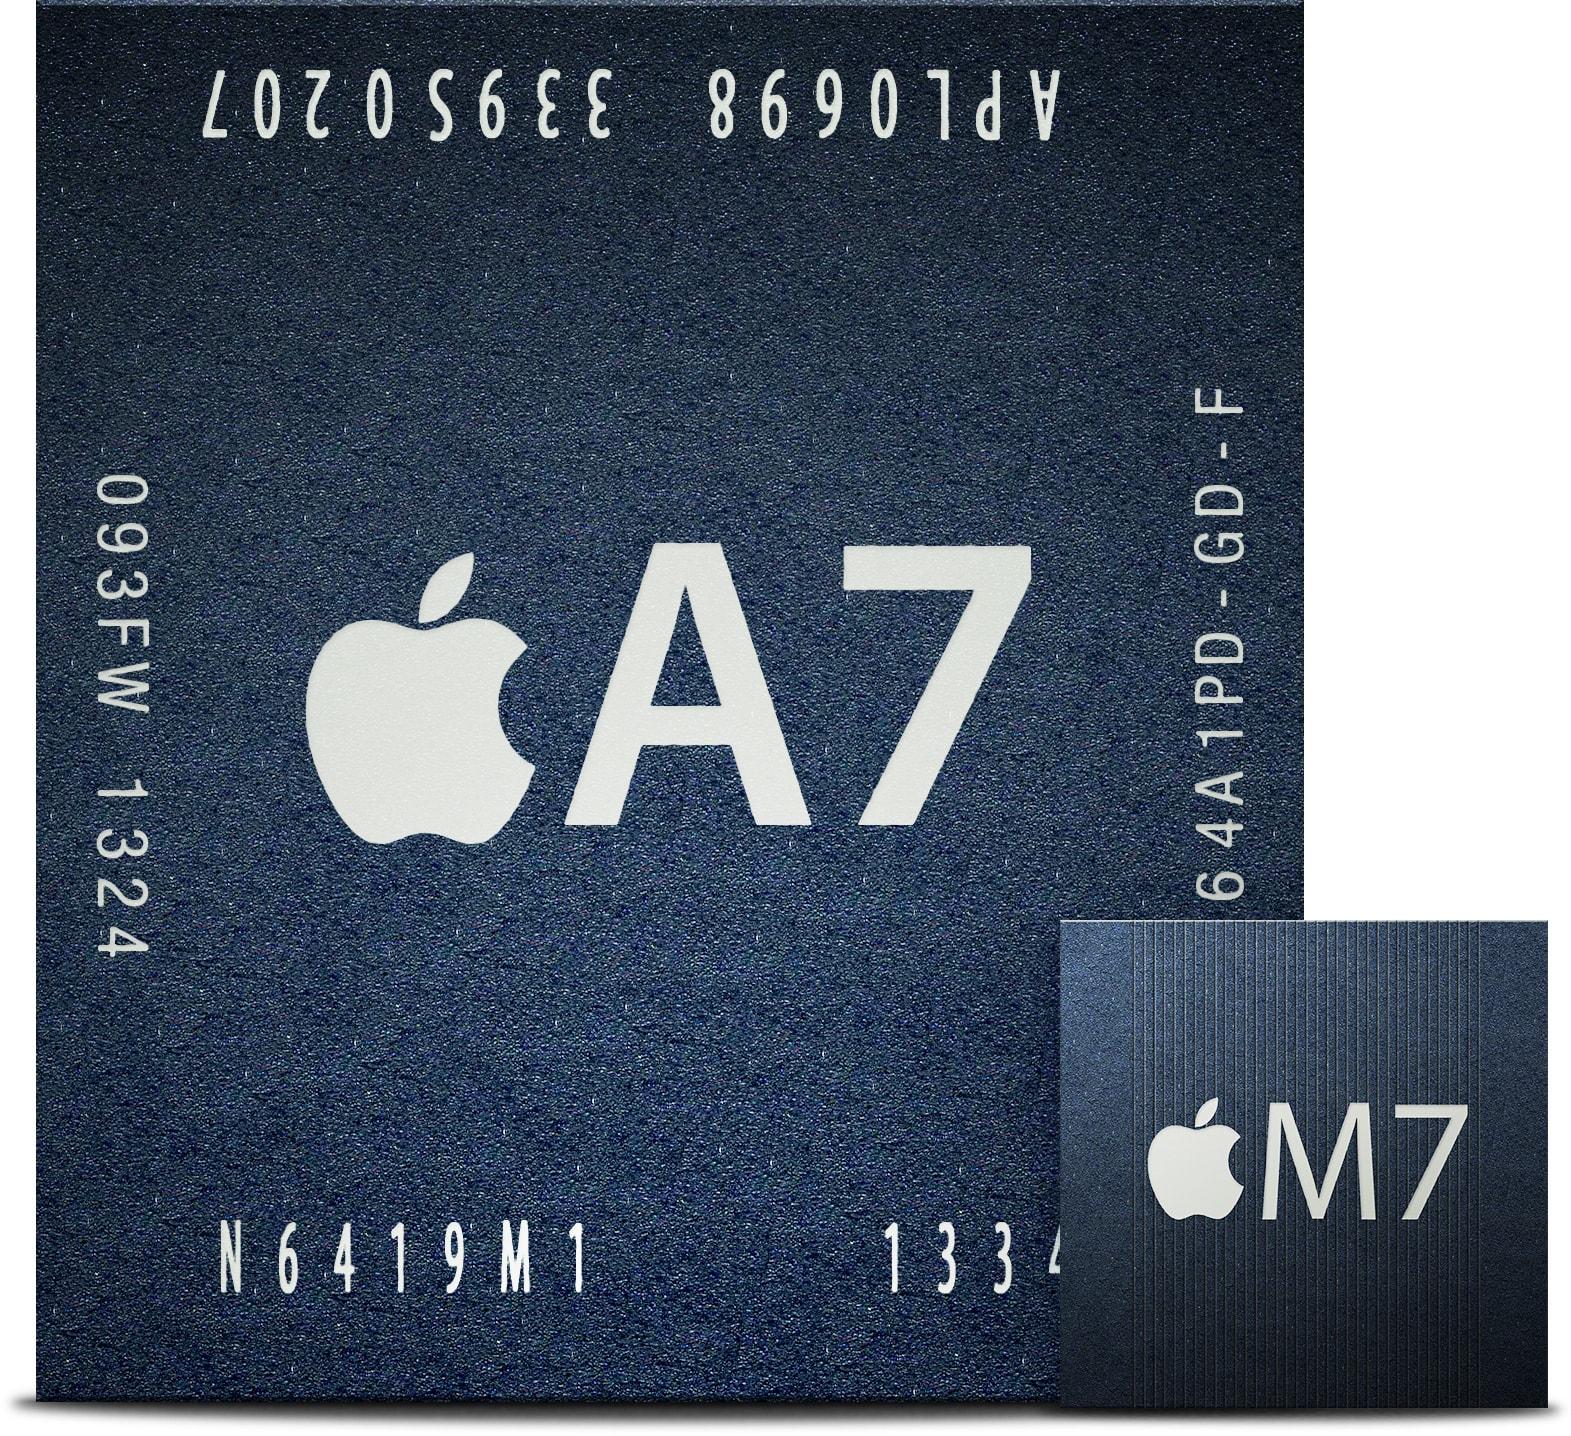 Chips A7 e M7, da Apple